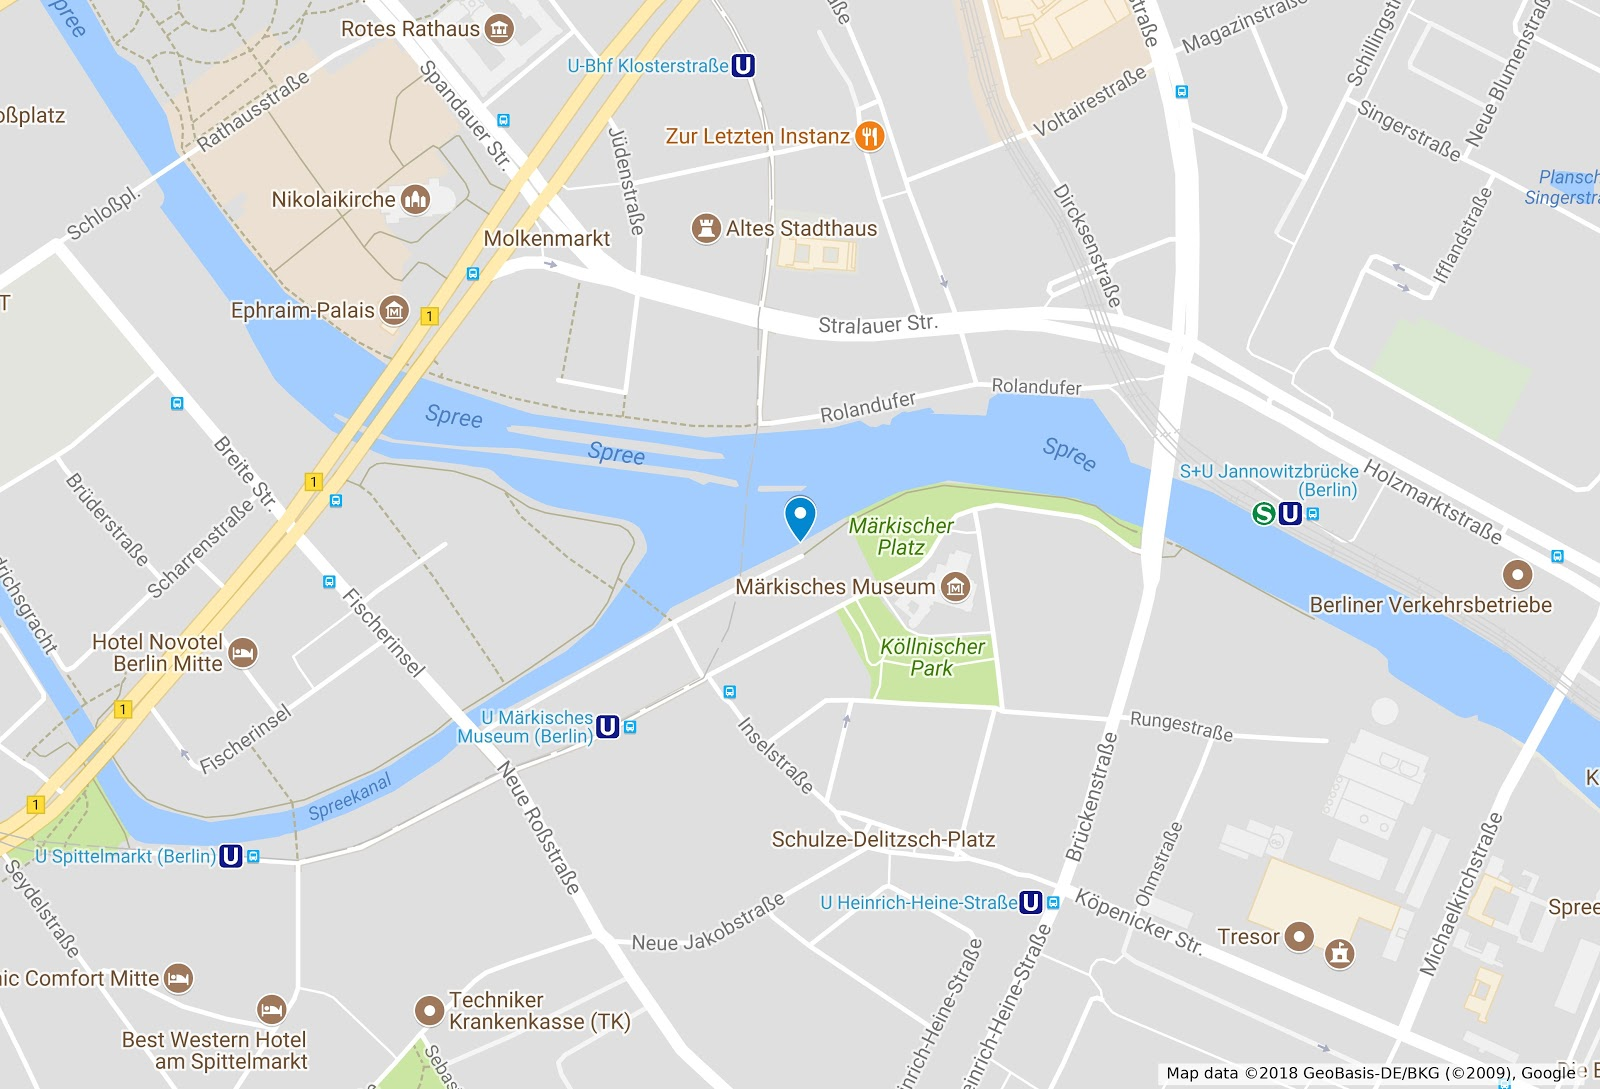 GPS: 52.51392, 13.41283